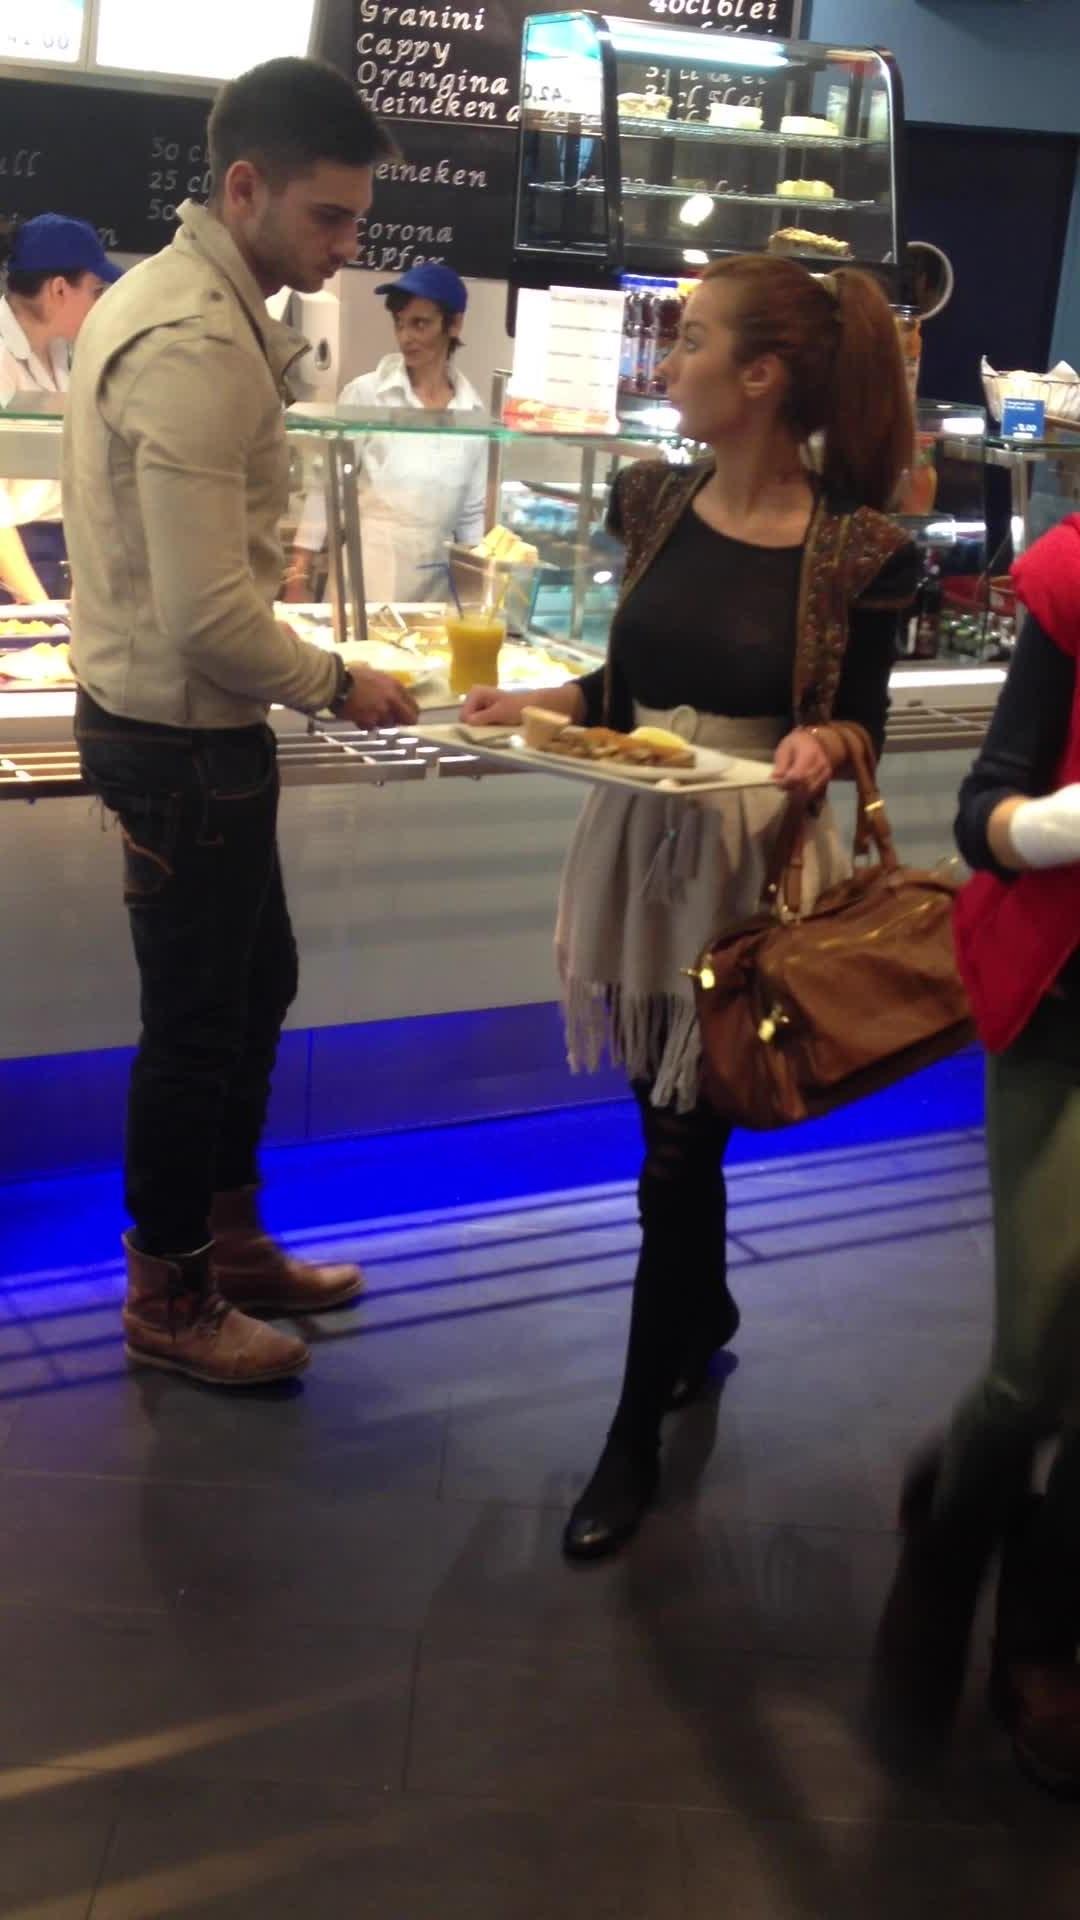 Cei doi indragostiti s-au oprit sa manance ceva la un restuarant din mall